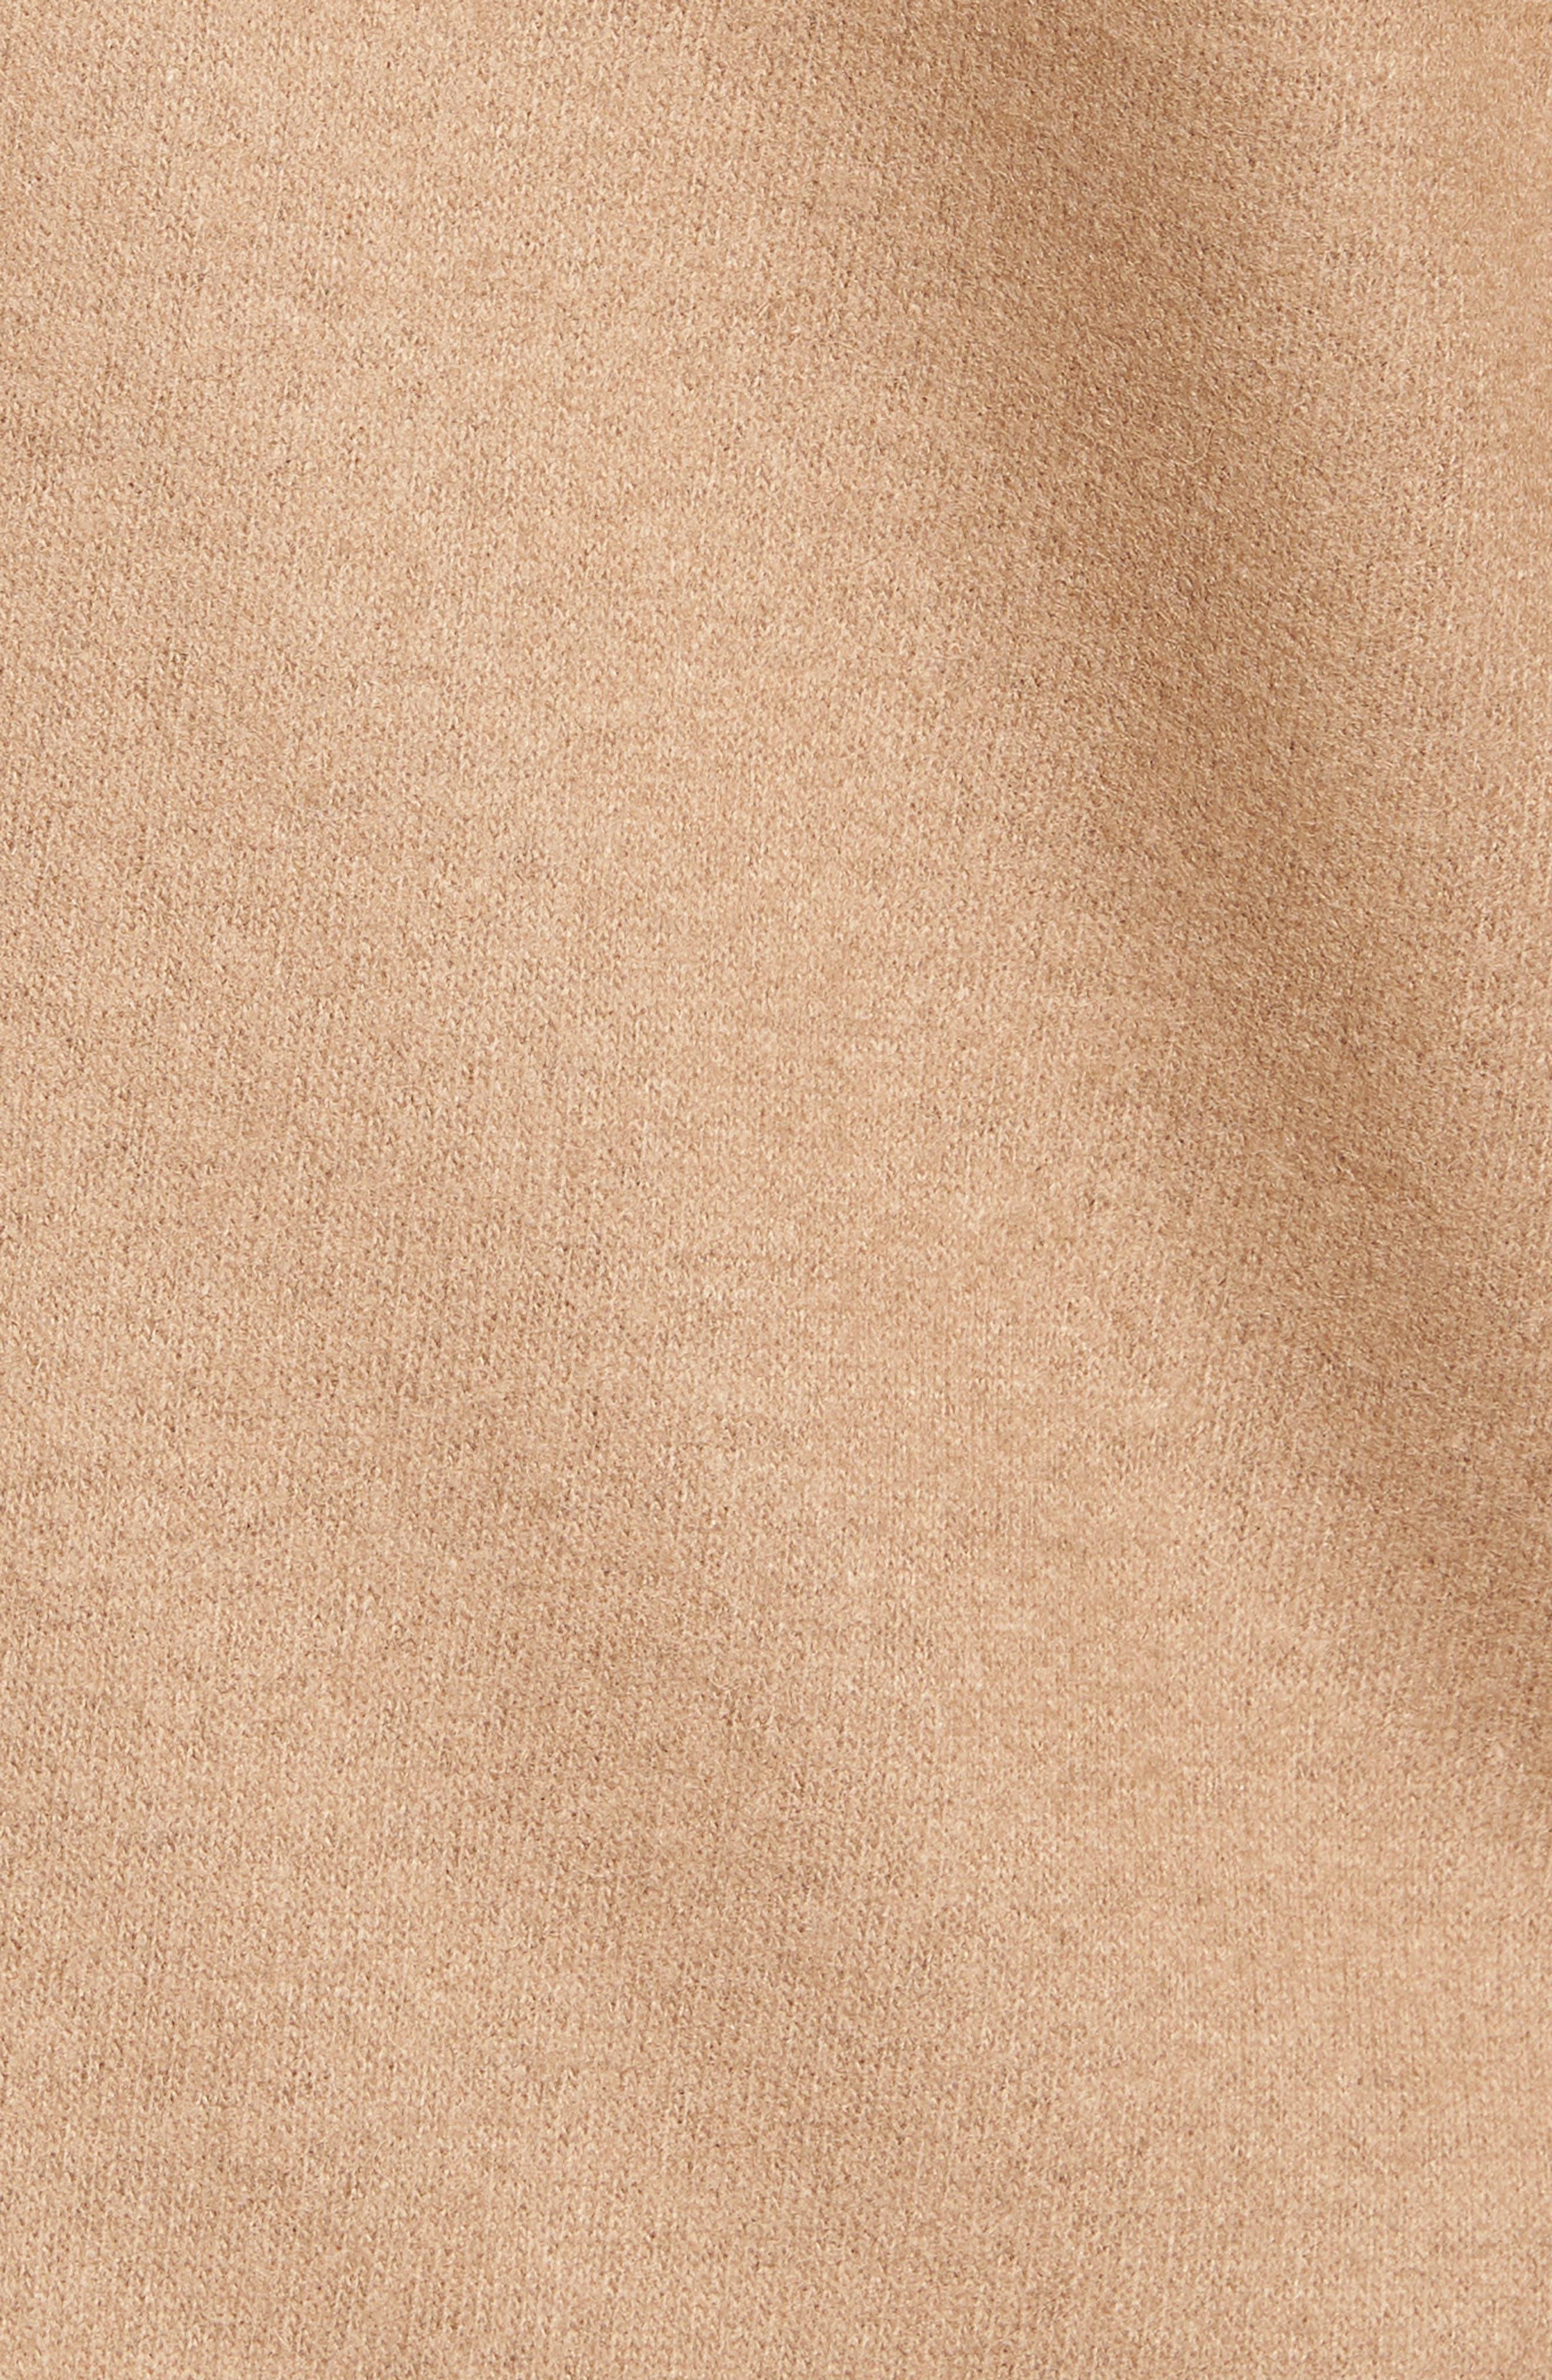 Nordin Trim Fit Virgin Wool Sport Coat,                             Alternate thumbnail 6, color,                             262